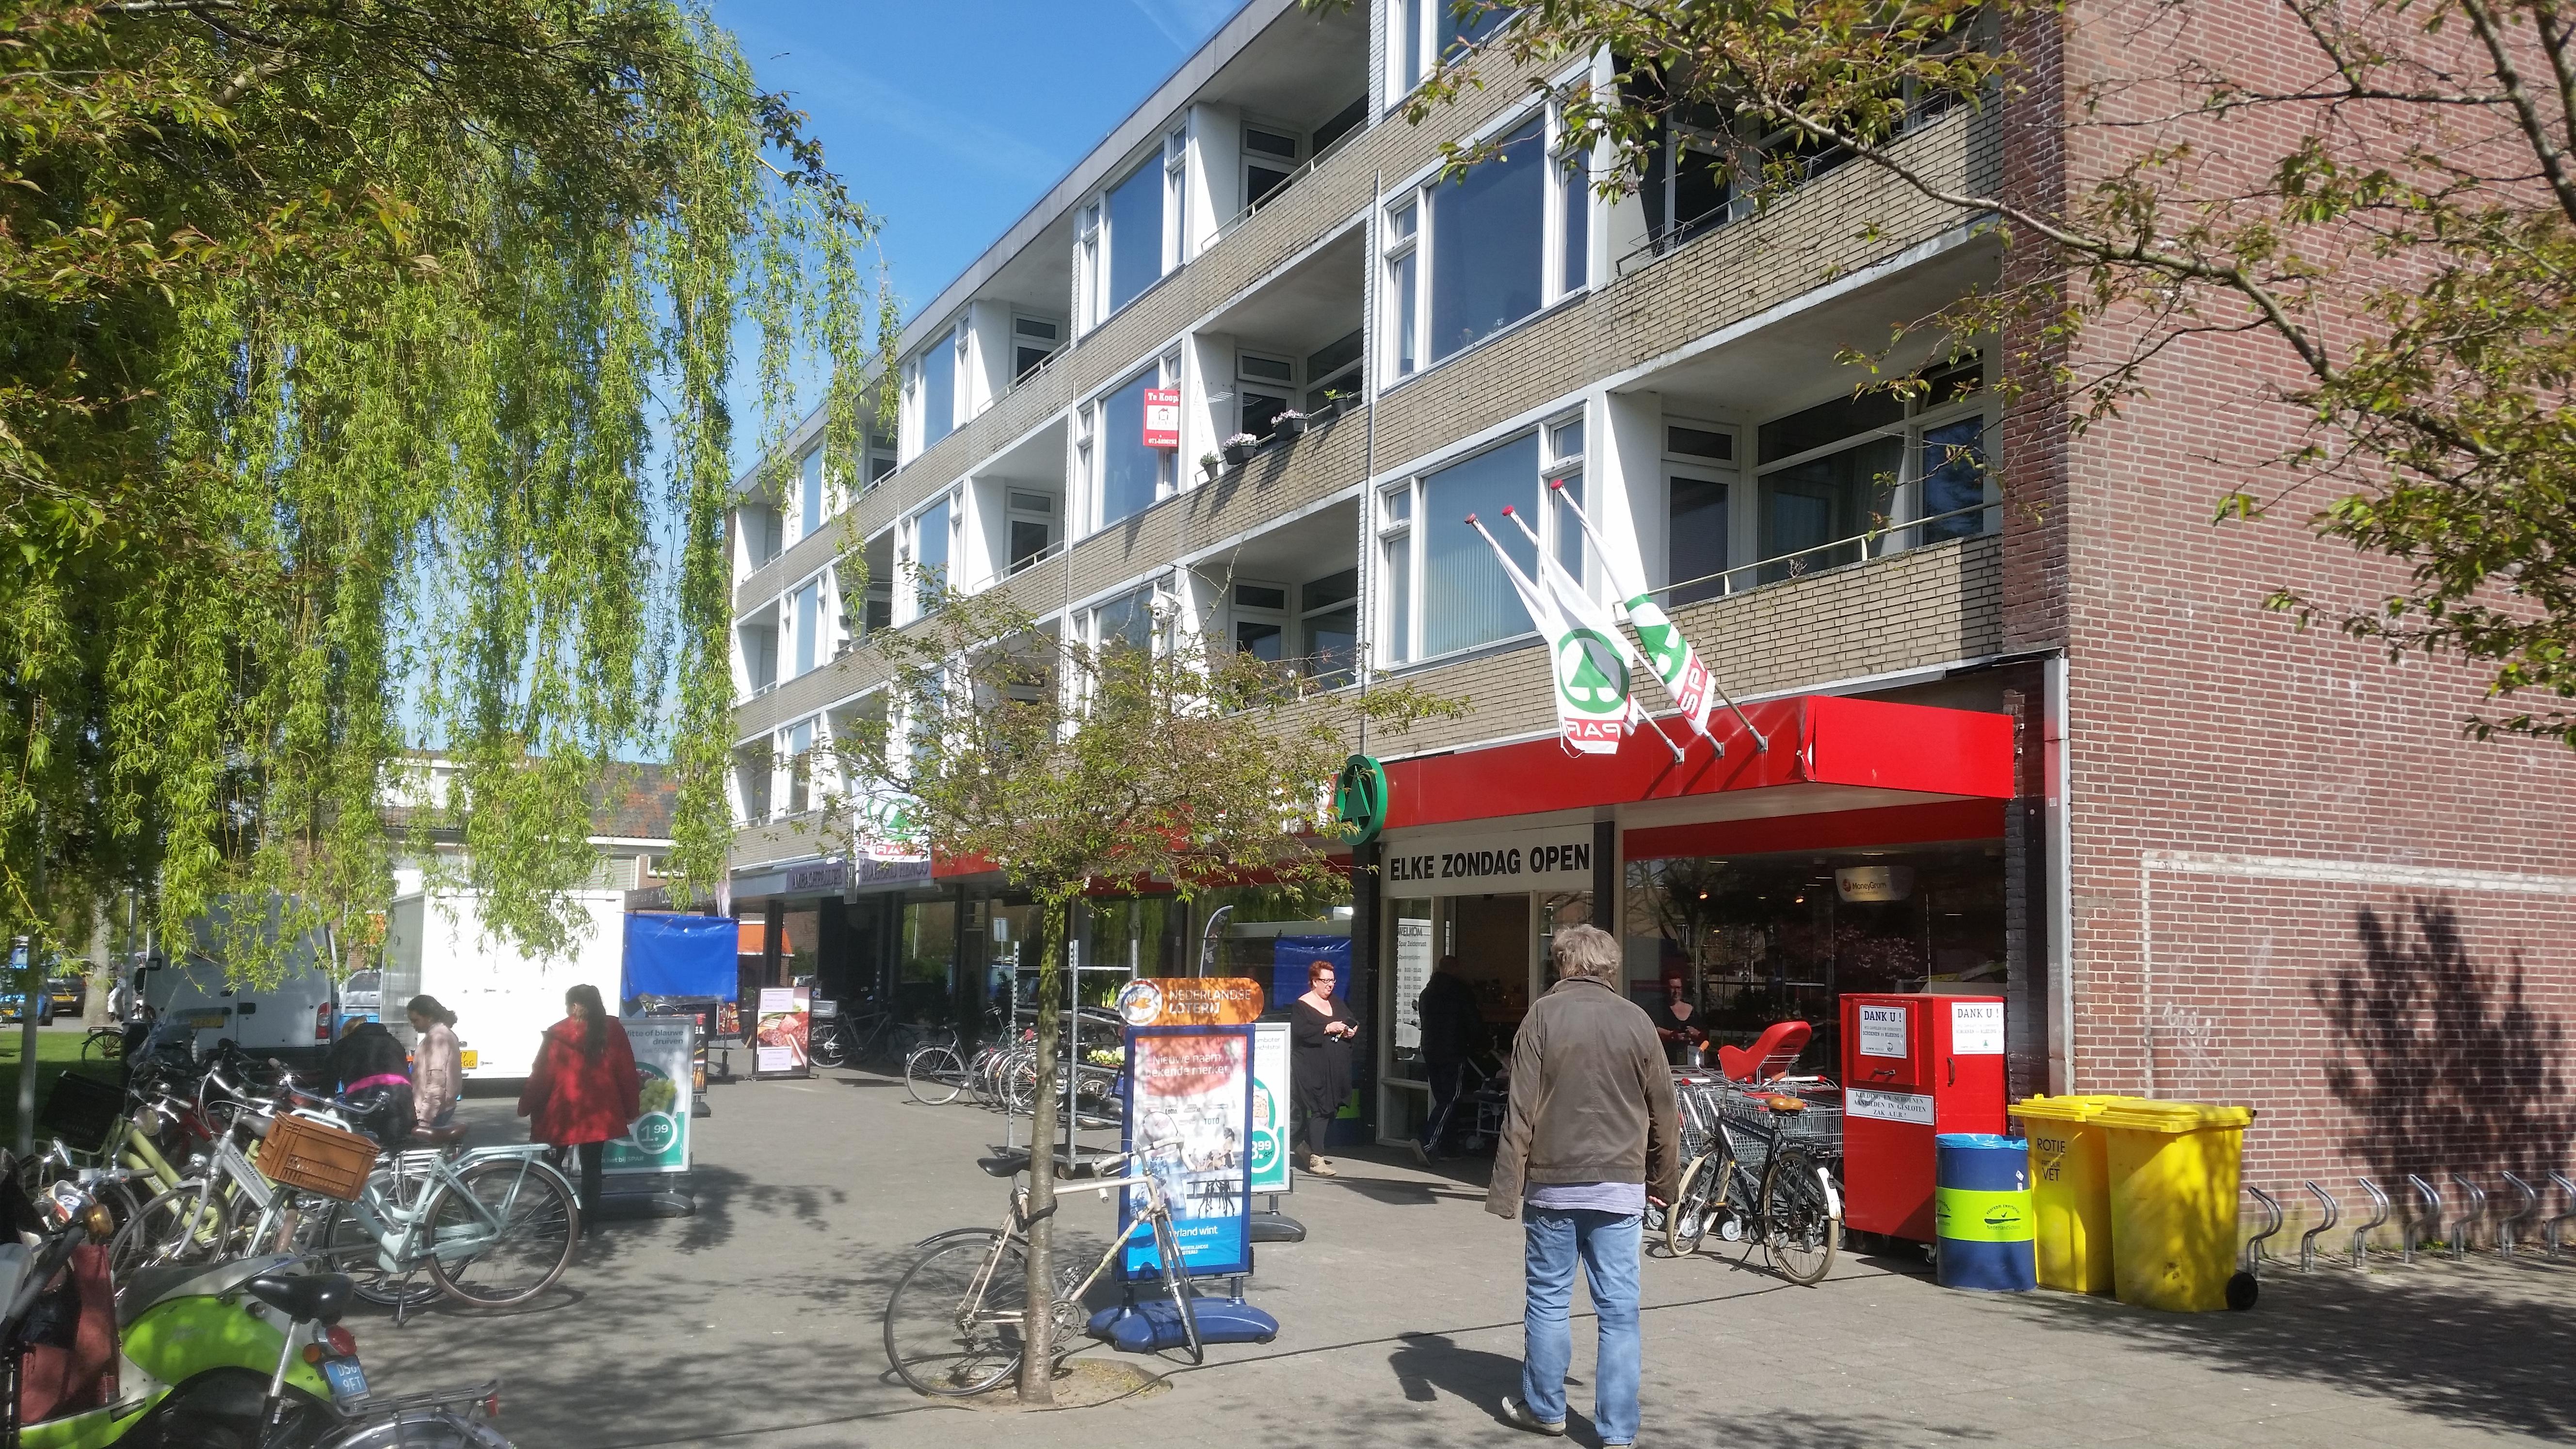 Actieplannen retailvisie Leidse regio